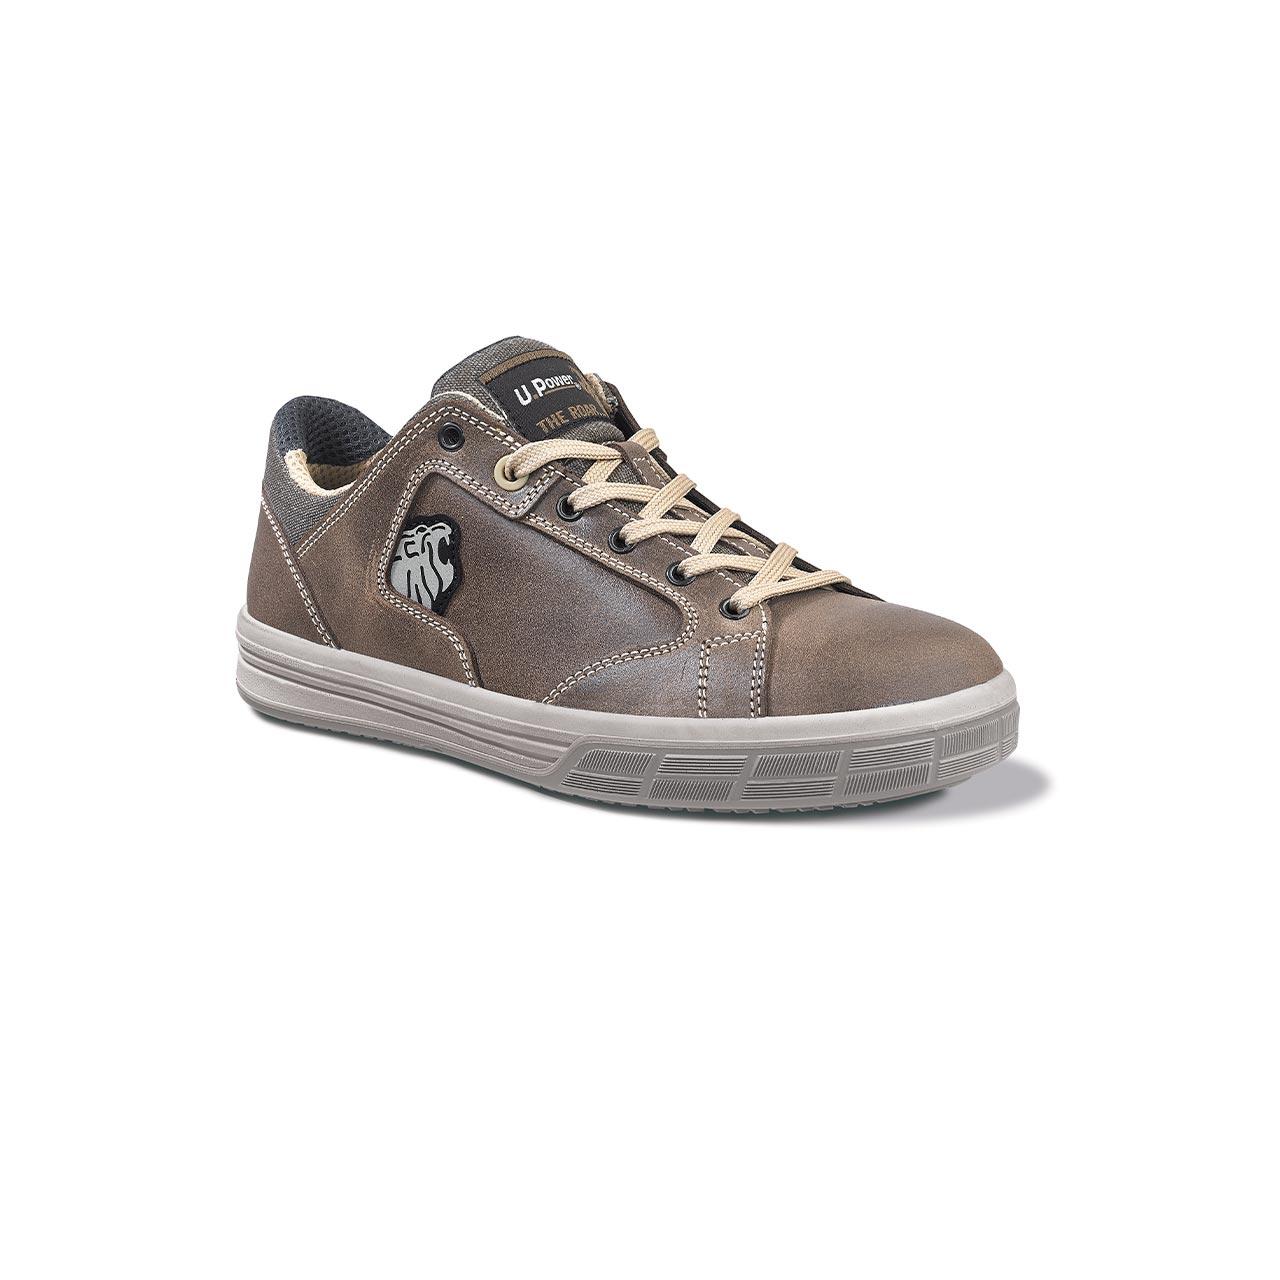 scarpa antinfortunistica upower modello savana linea theroar vista laterale